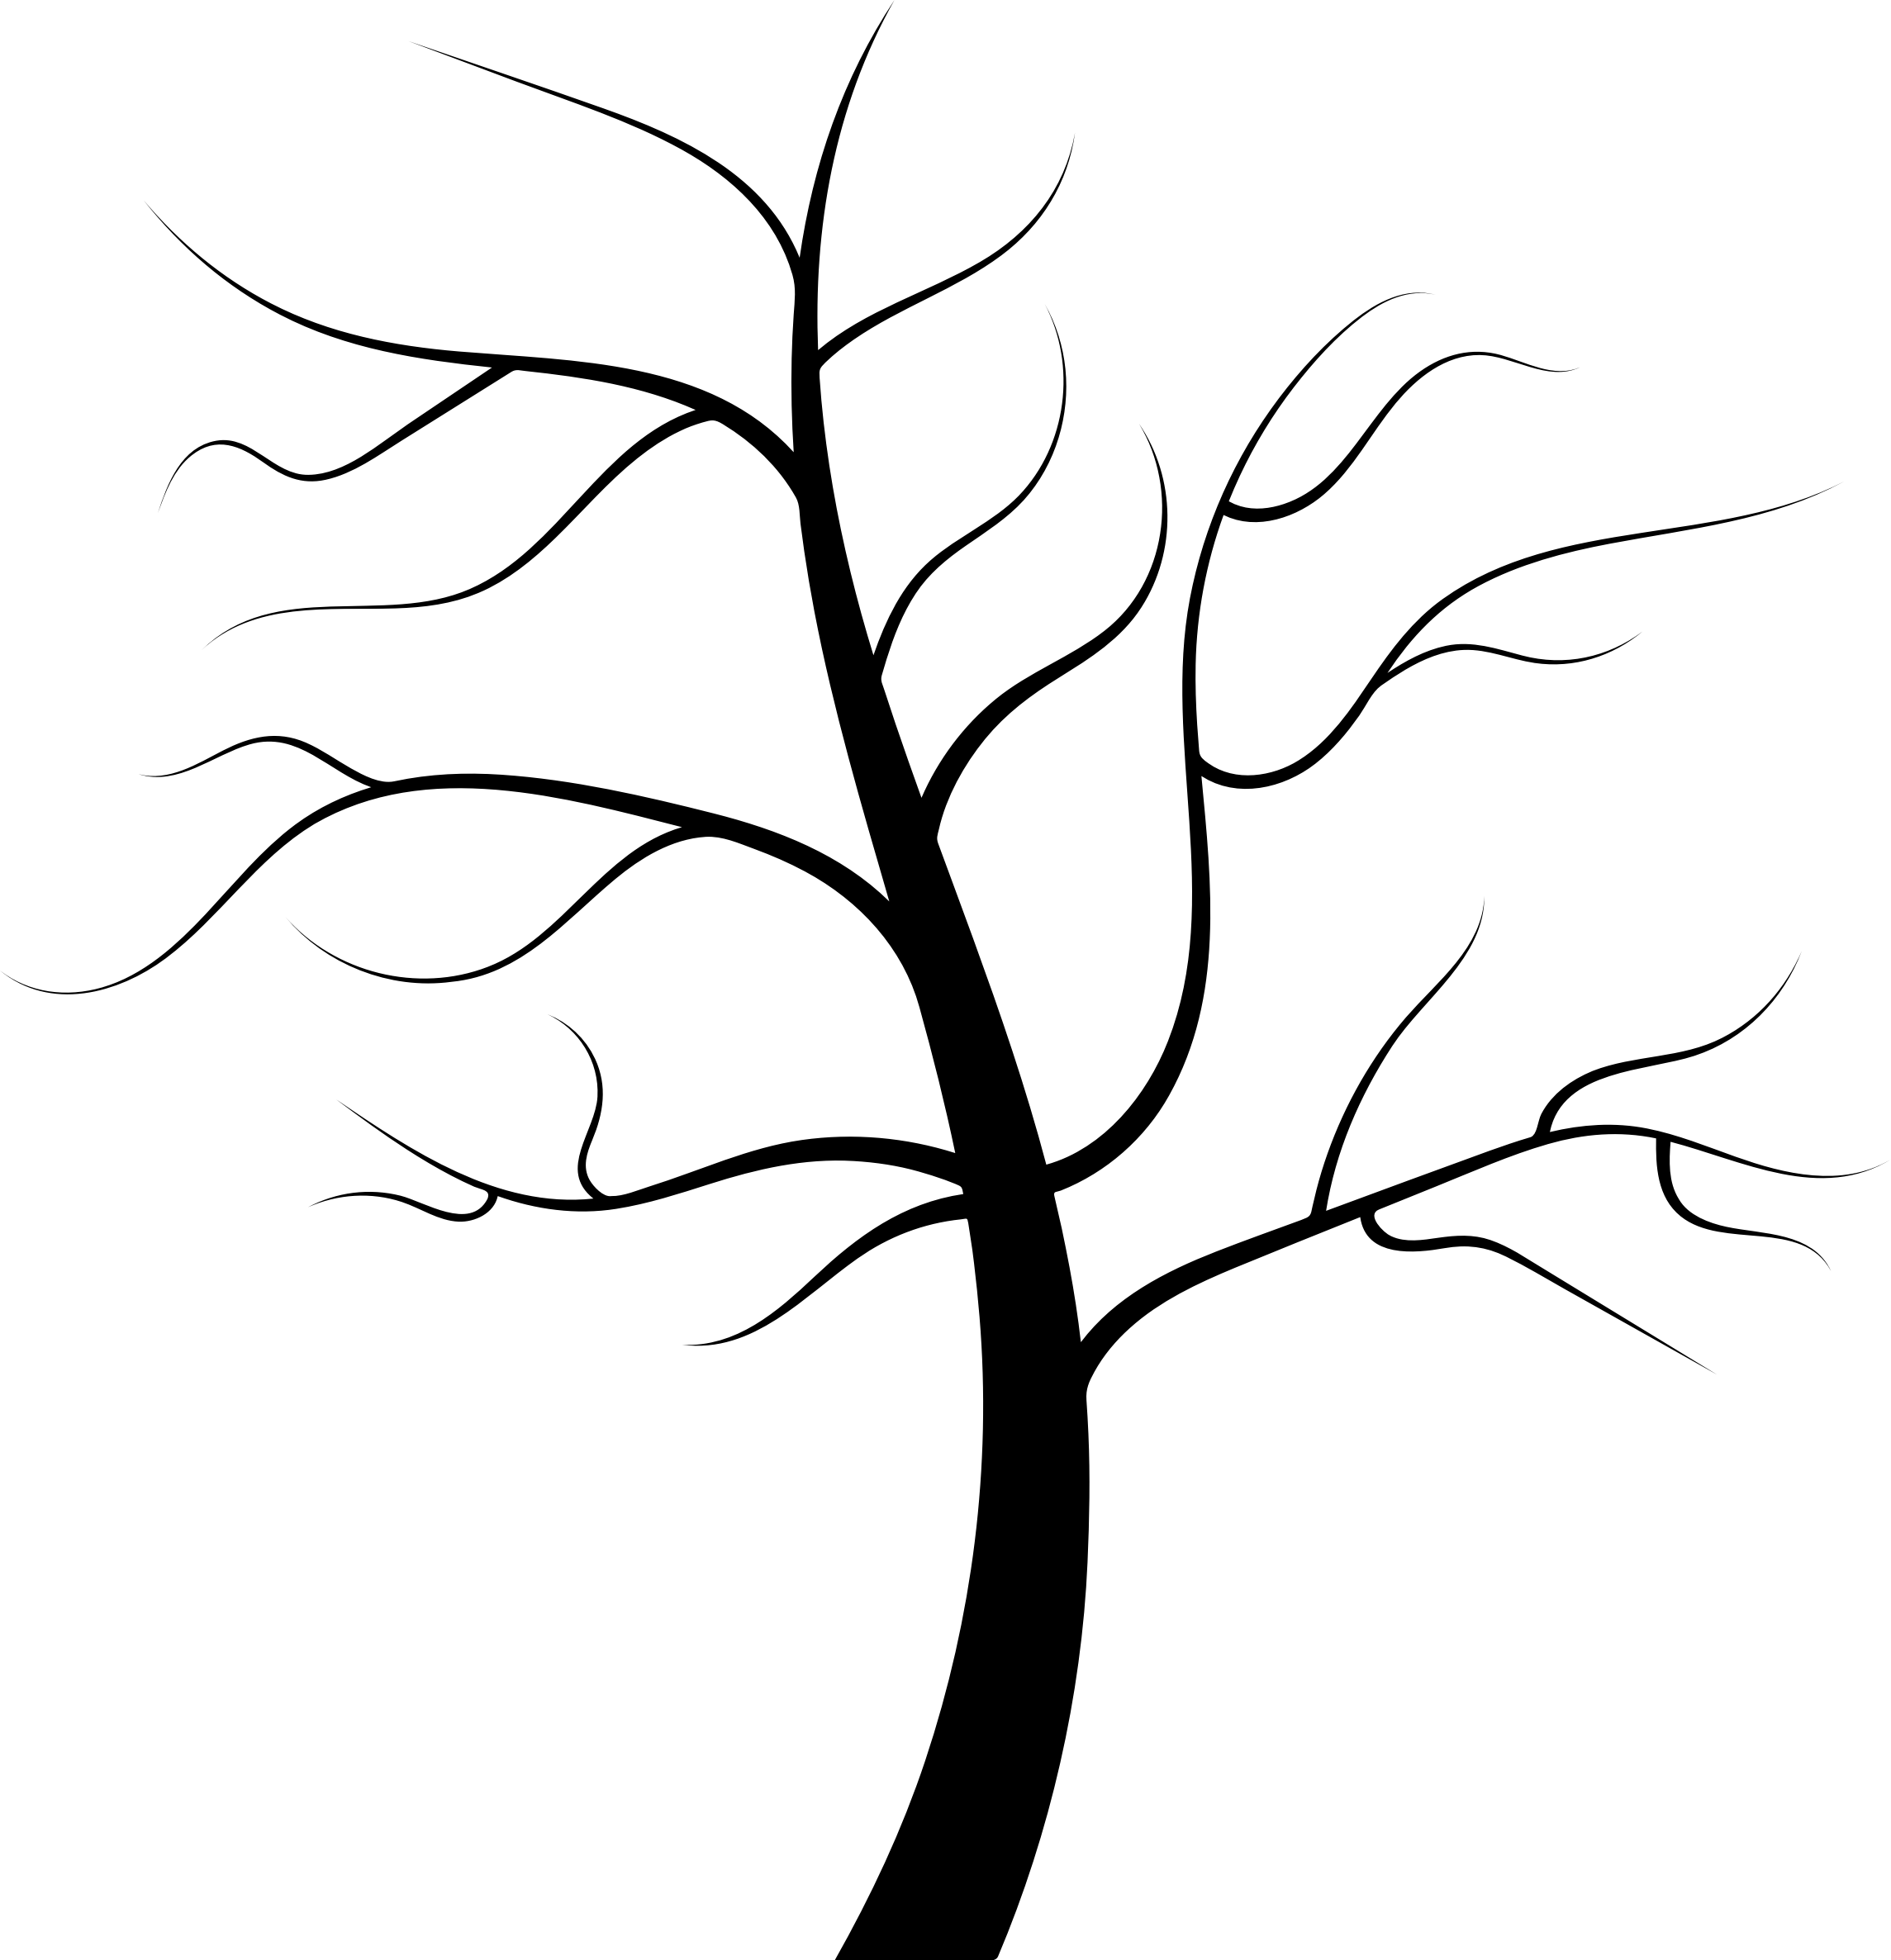 2289x2373 Clipart